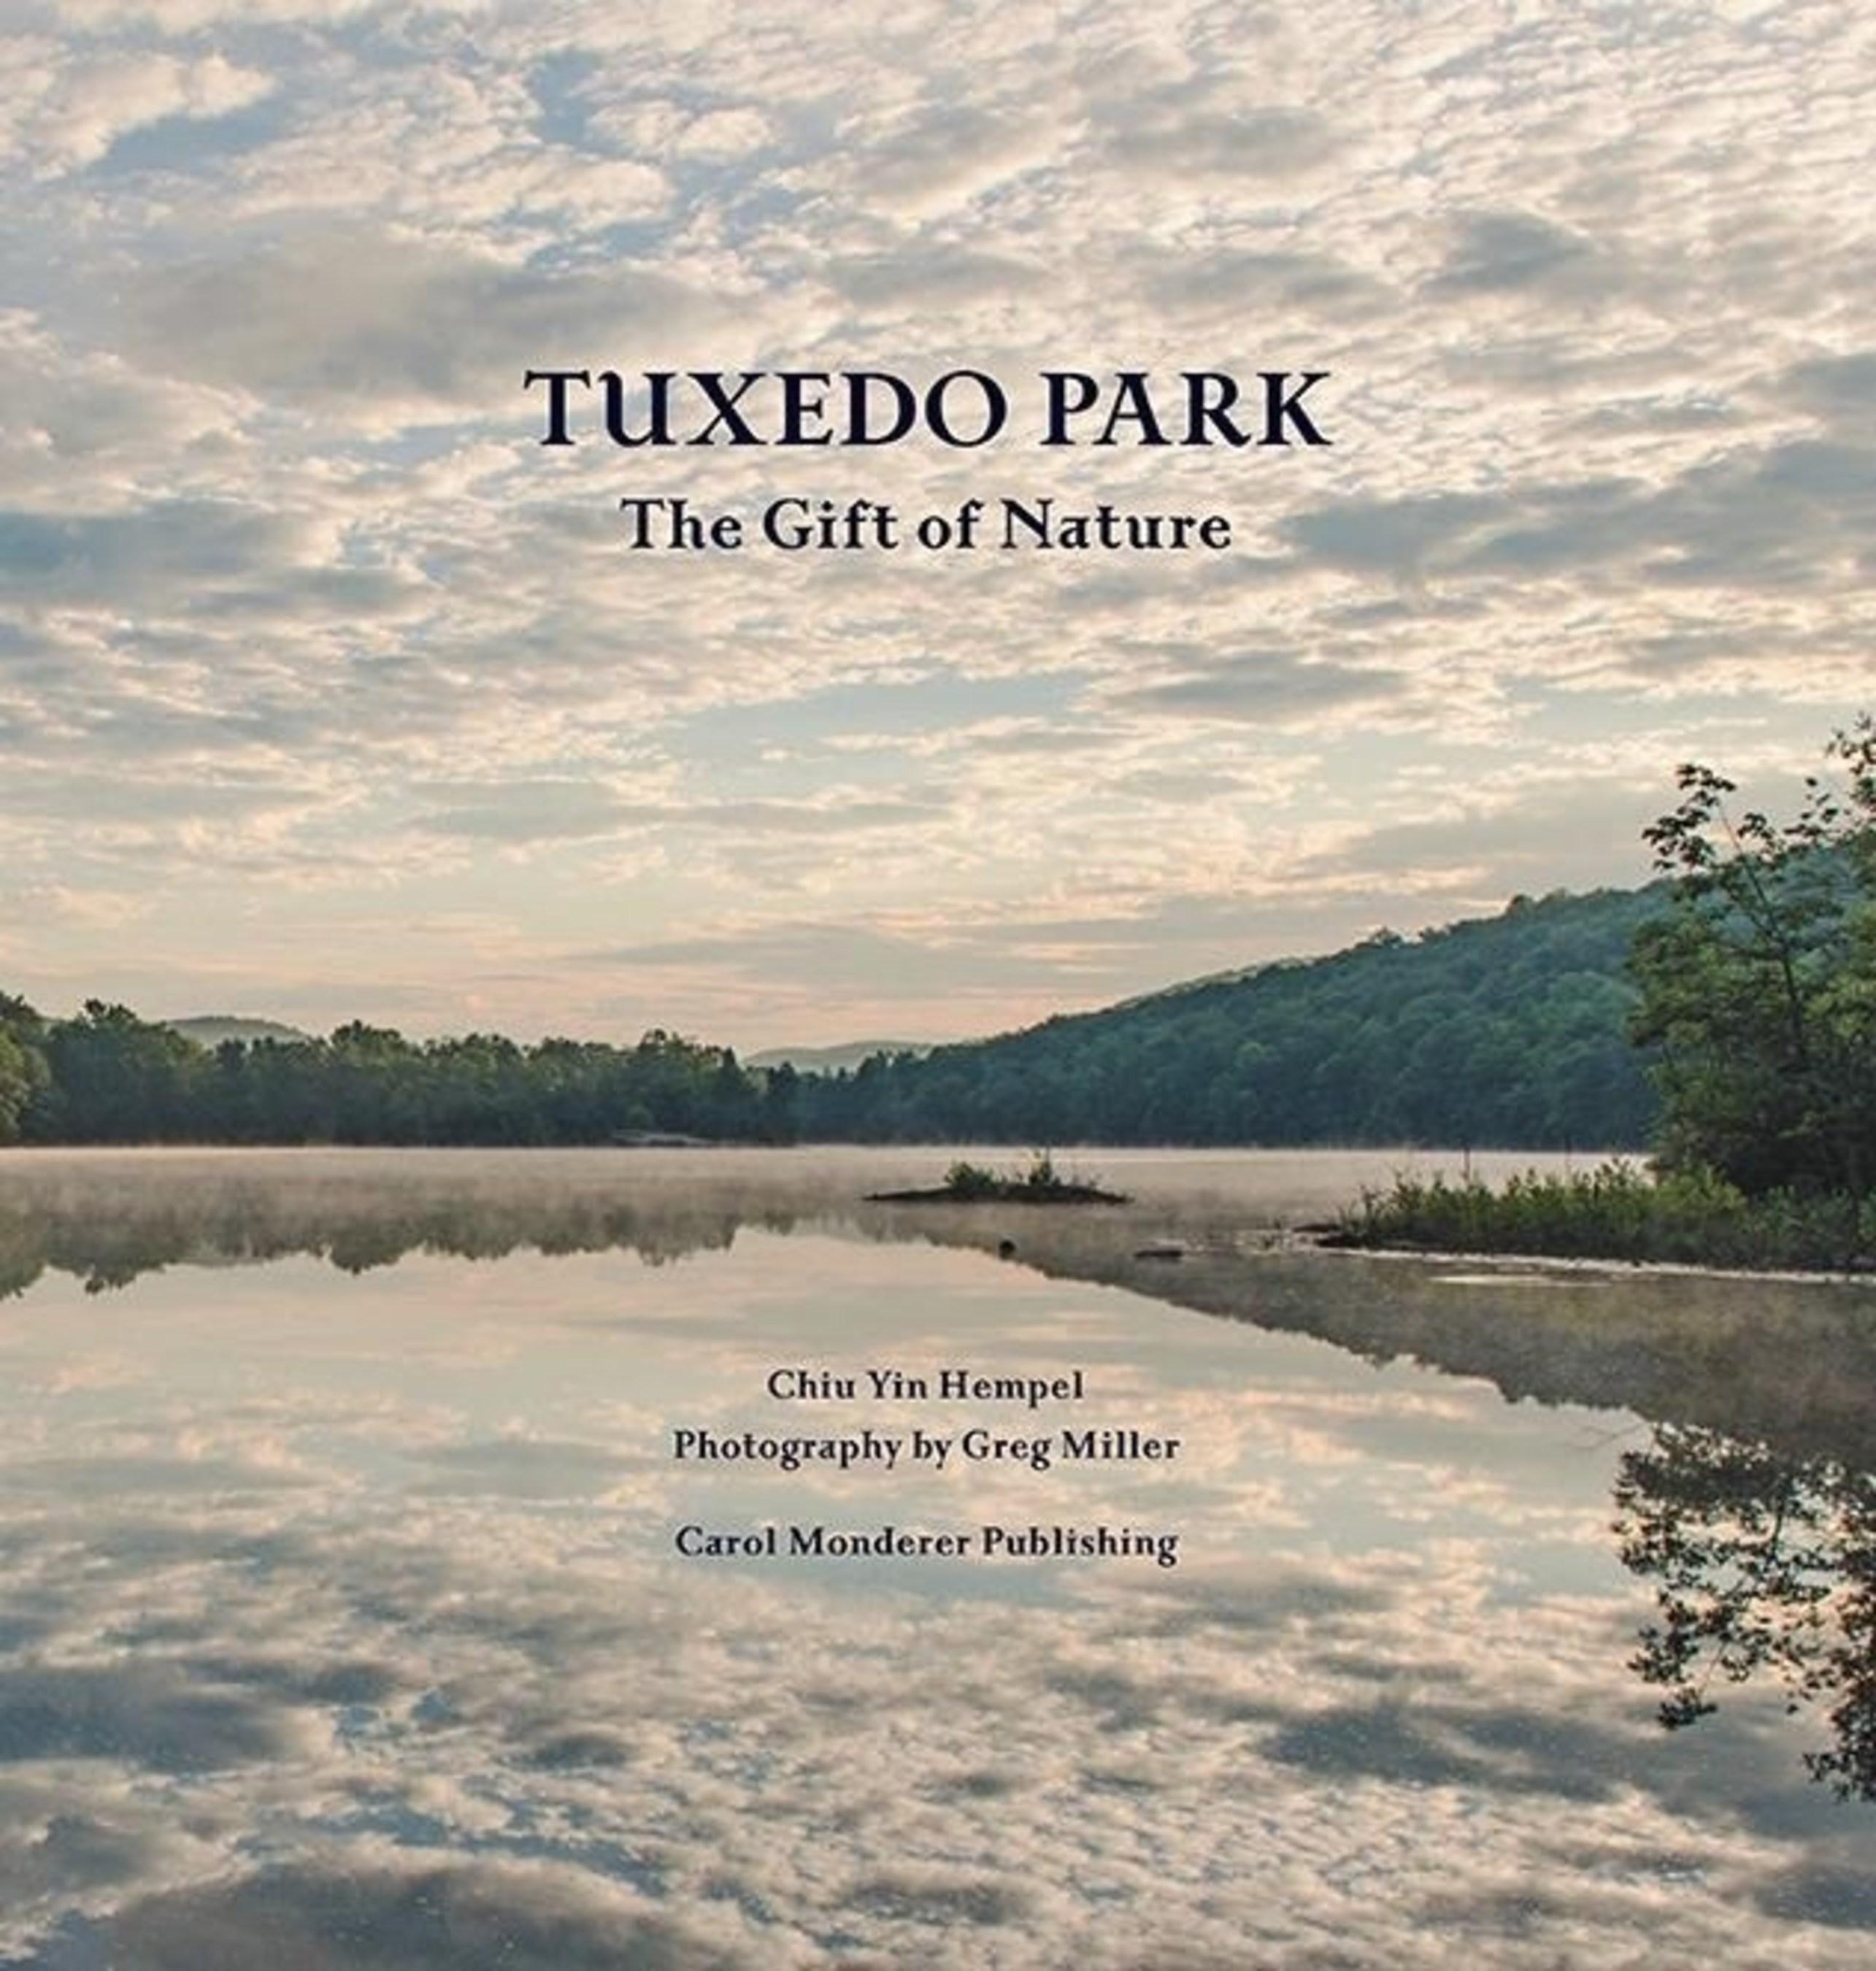 Tuxedo Park: The Gift of Nature. Author Chiu Yin Hempel. Photography by Greg Miller.